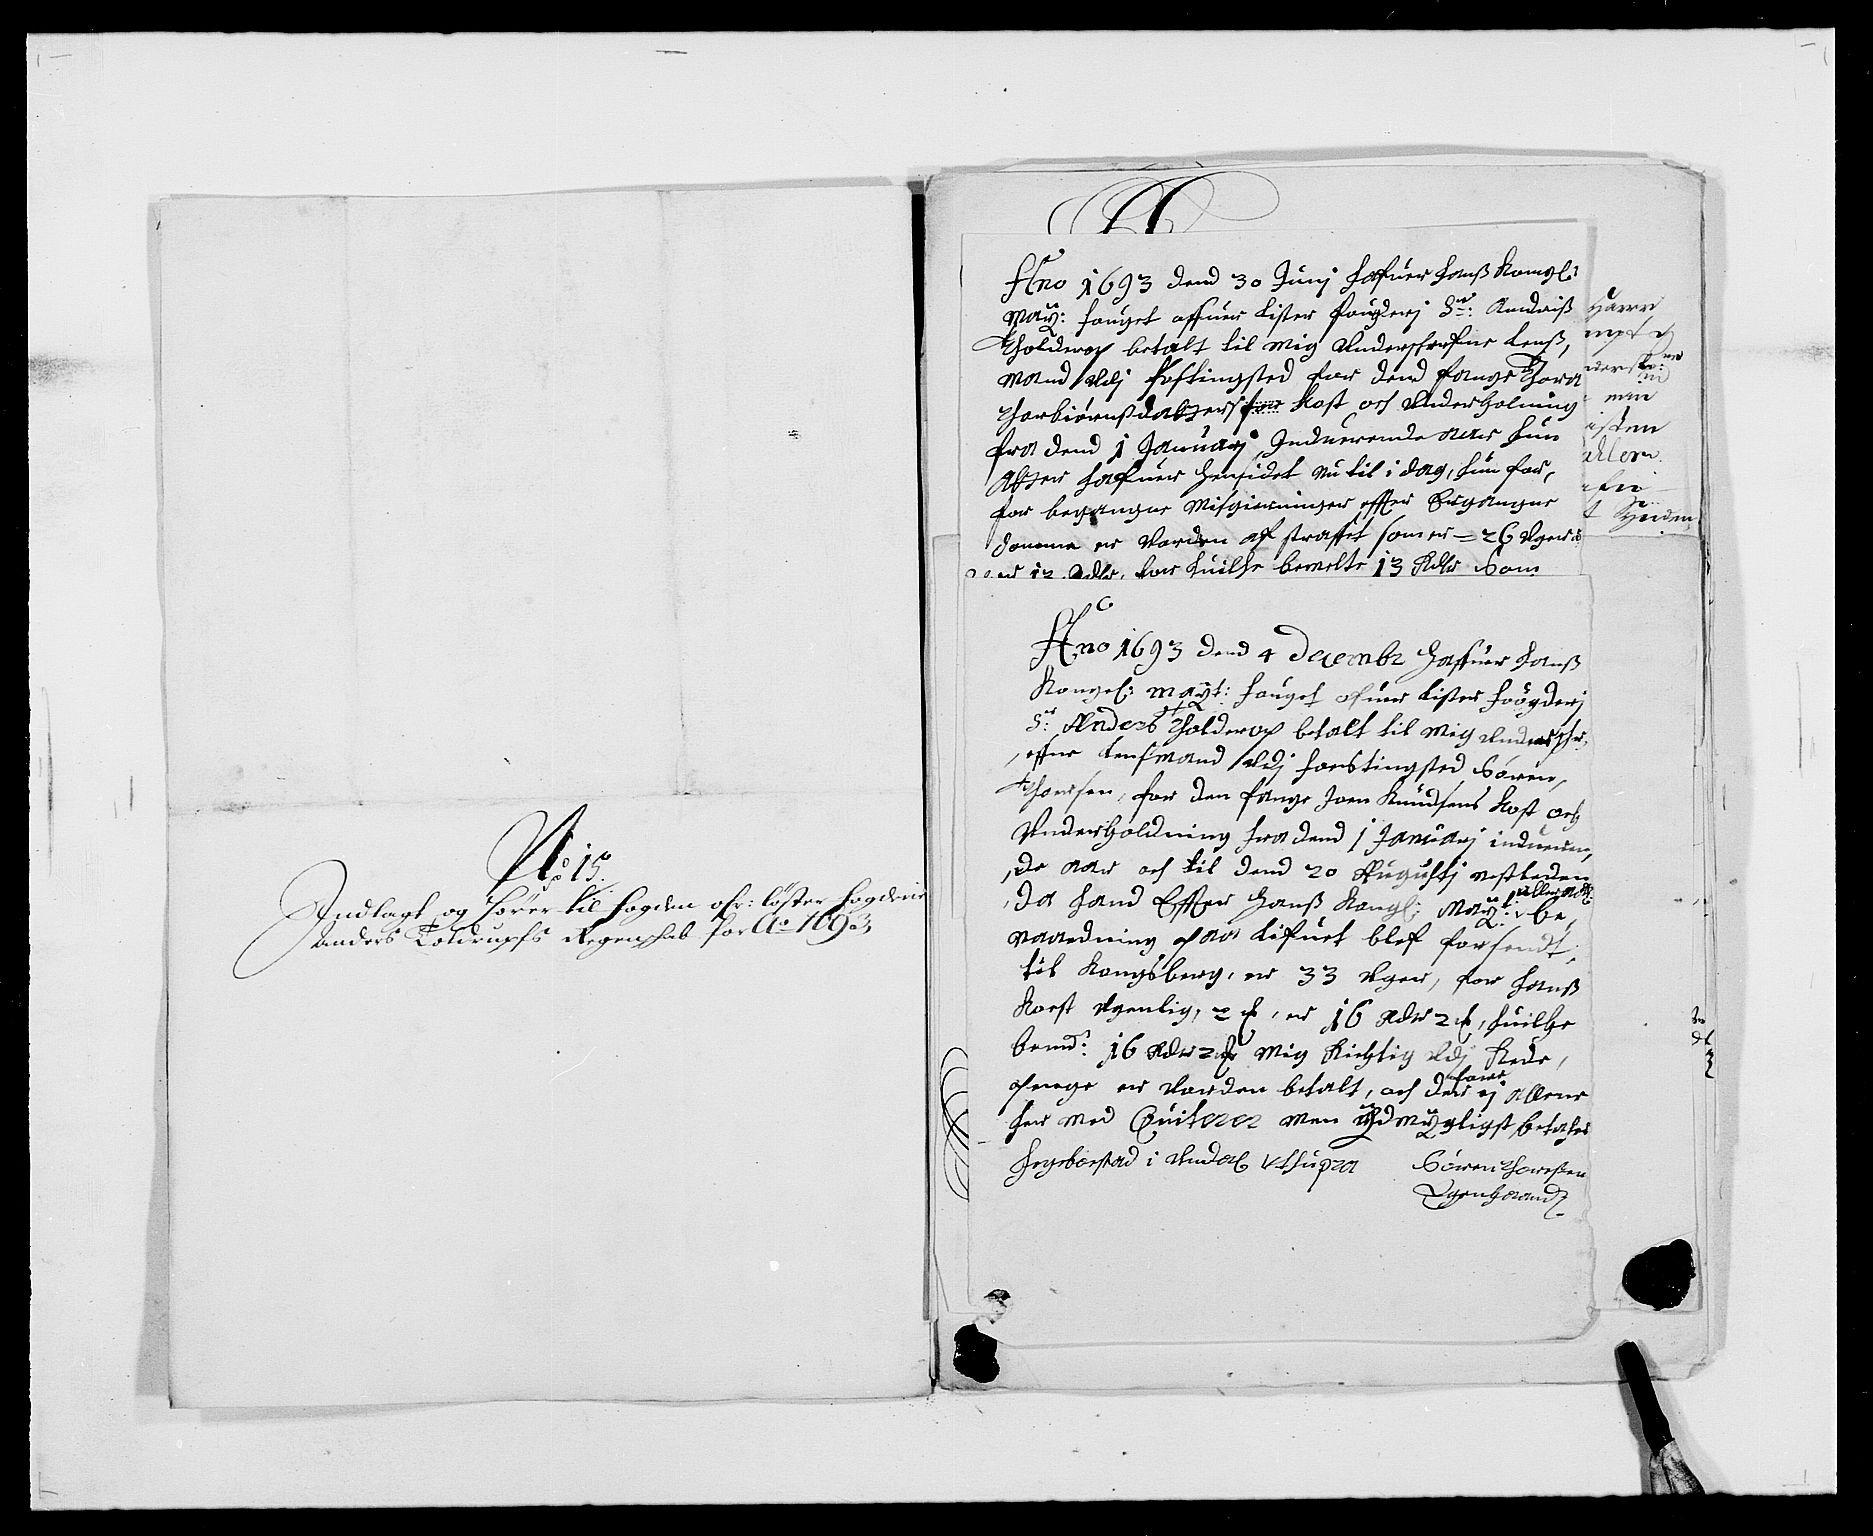 RA, Rentekammeret inntil 1814, Reviderte regnskaper, Fogderegnskap, R41/L2536: Fogderegnskap Lista, 1690-1693, s. 497